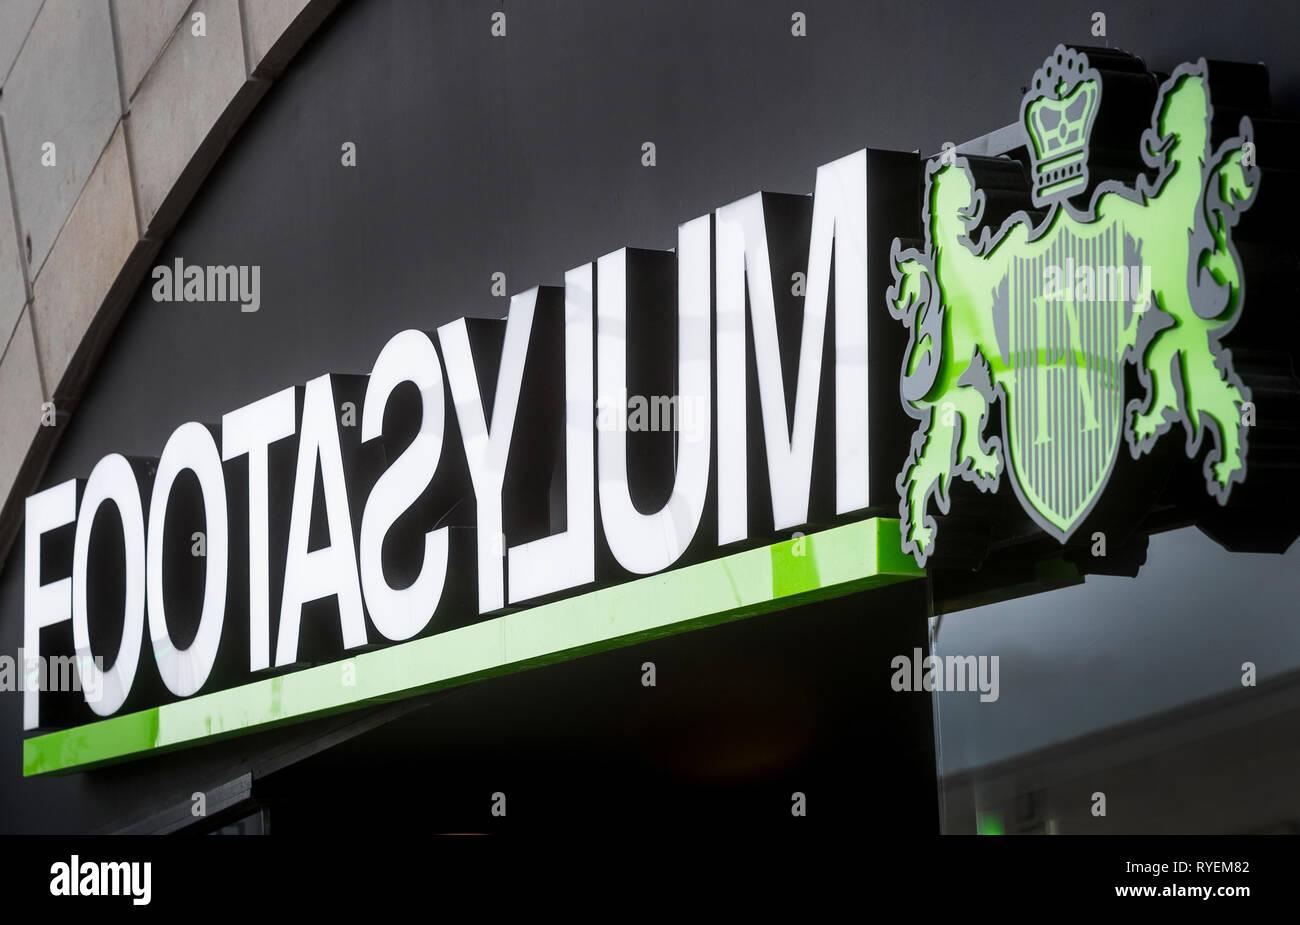 Tienda Footasylum en Southampton. Imagen De Stock